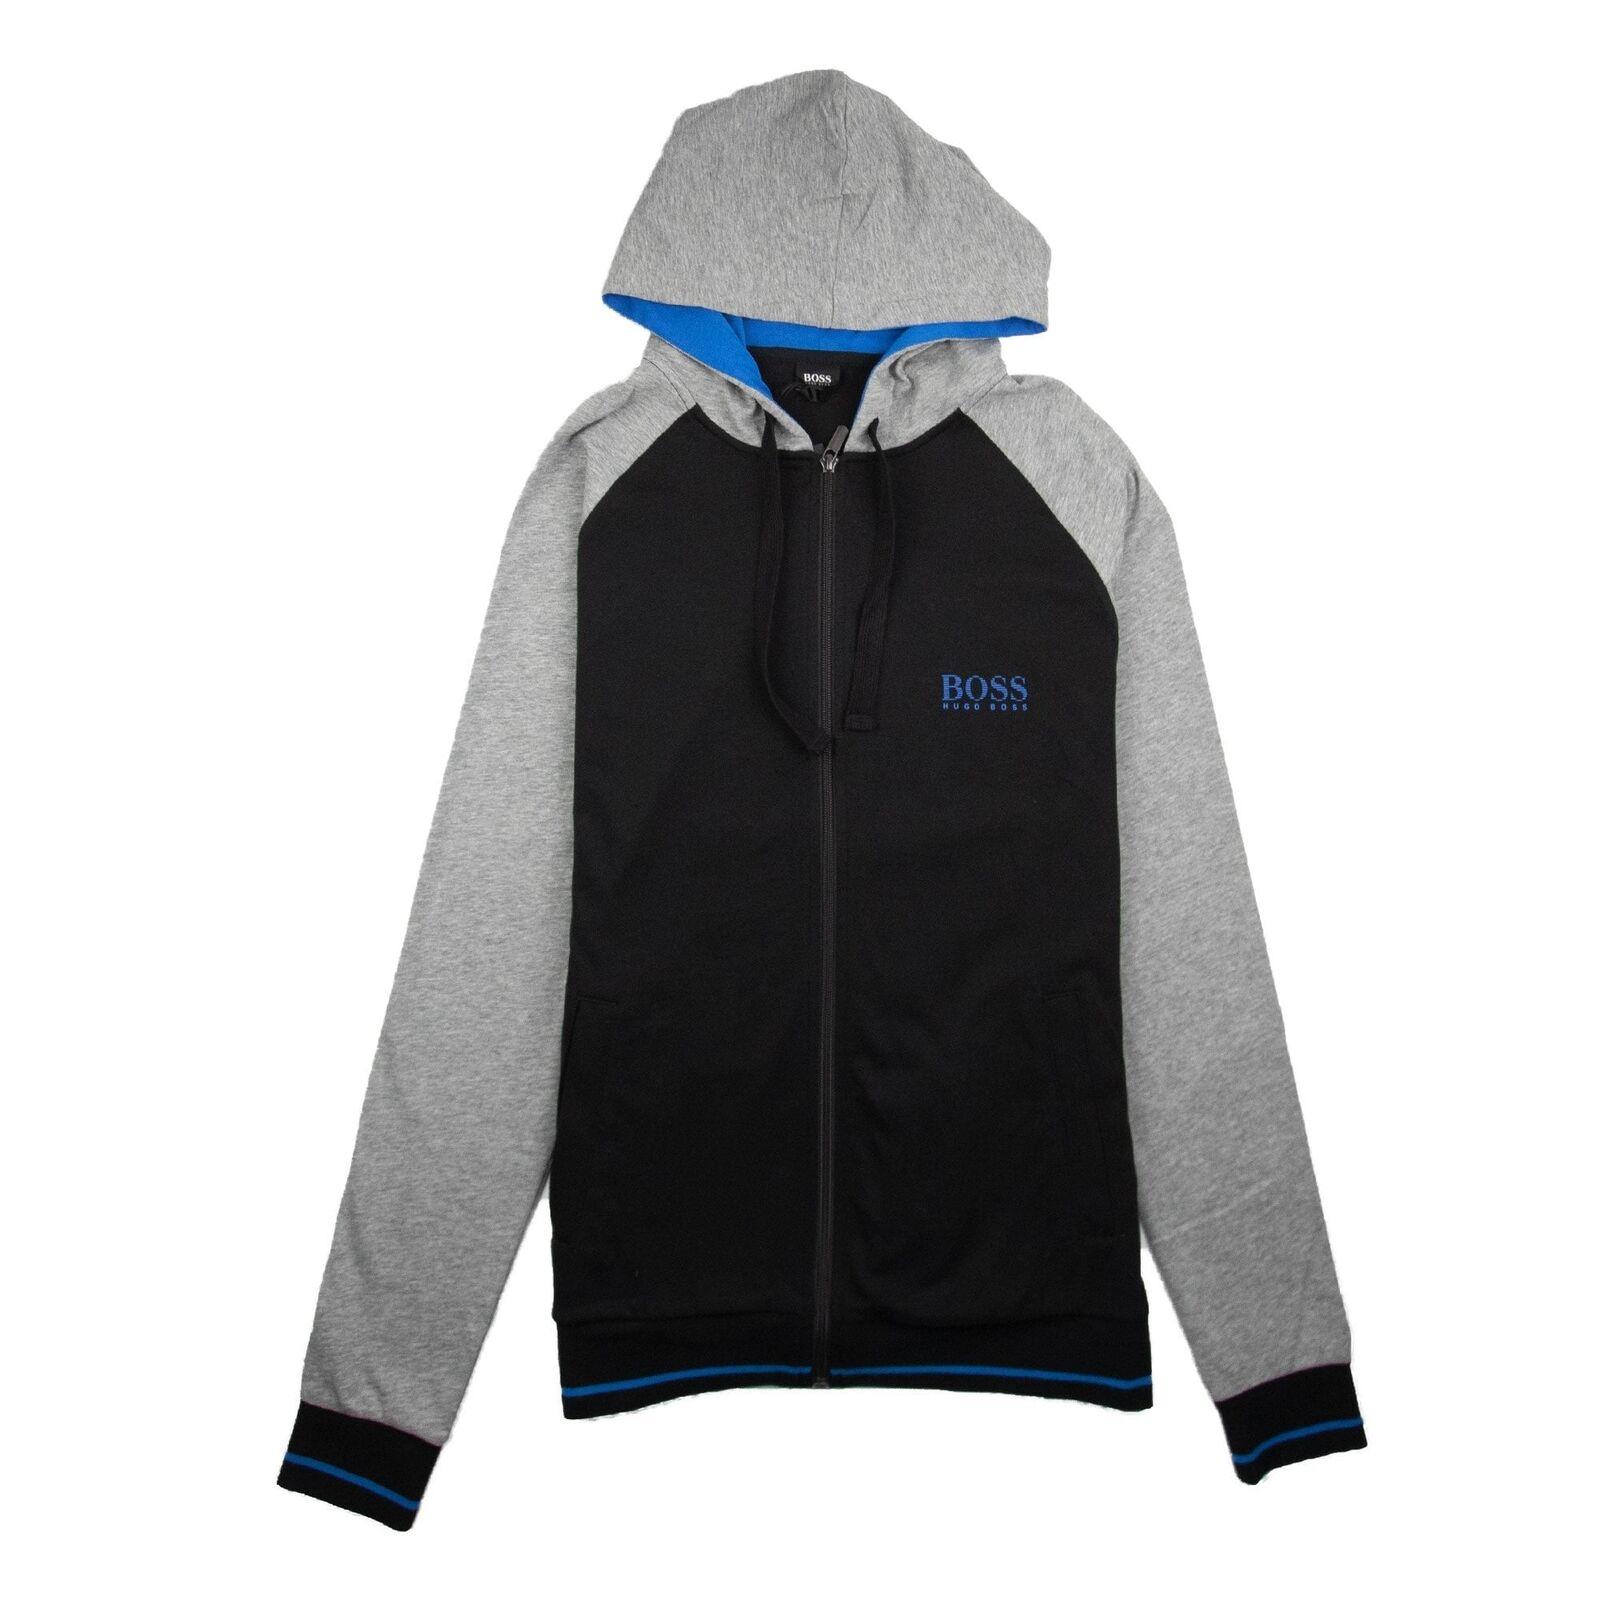 Hugo Boss Authentic Logo Zip Up Hoody schwarz Blau A1